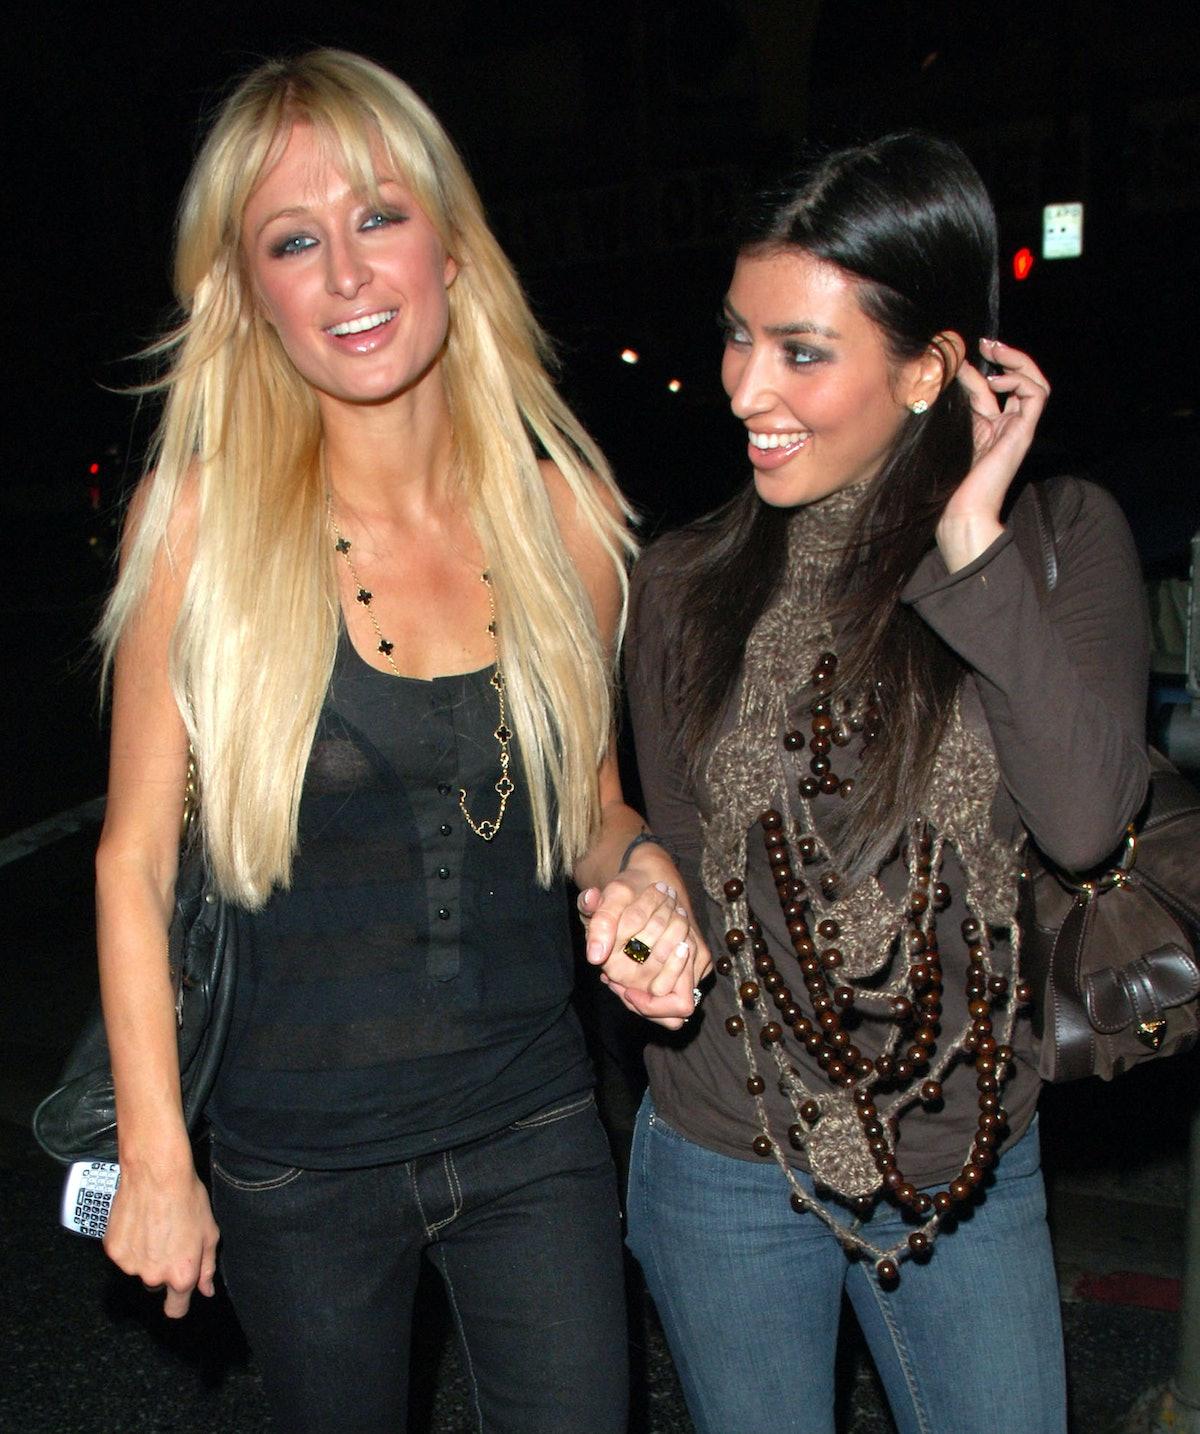 Paris Hilton and Kim Kardashian Sighting in Los Angeles - January 3, 2007